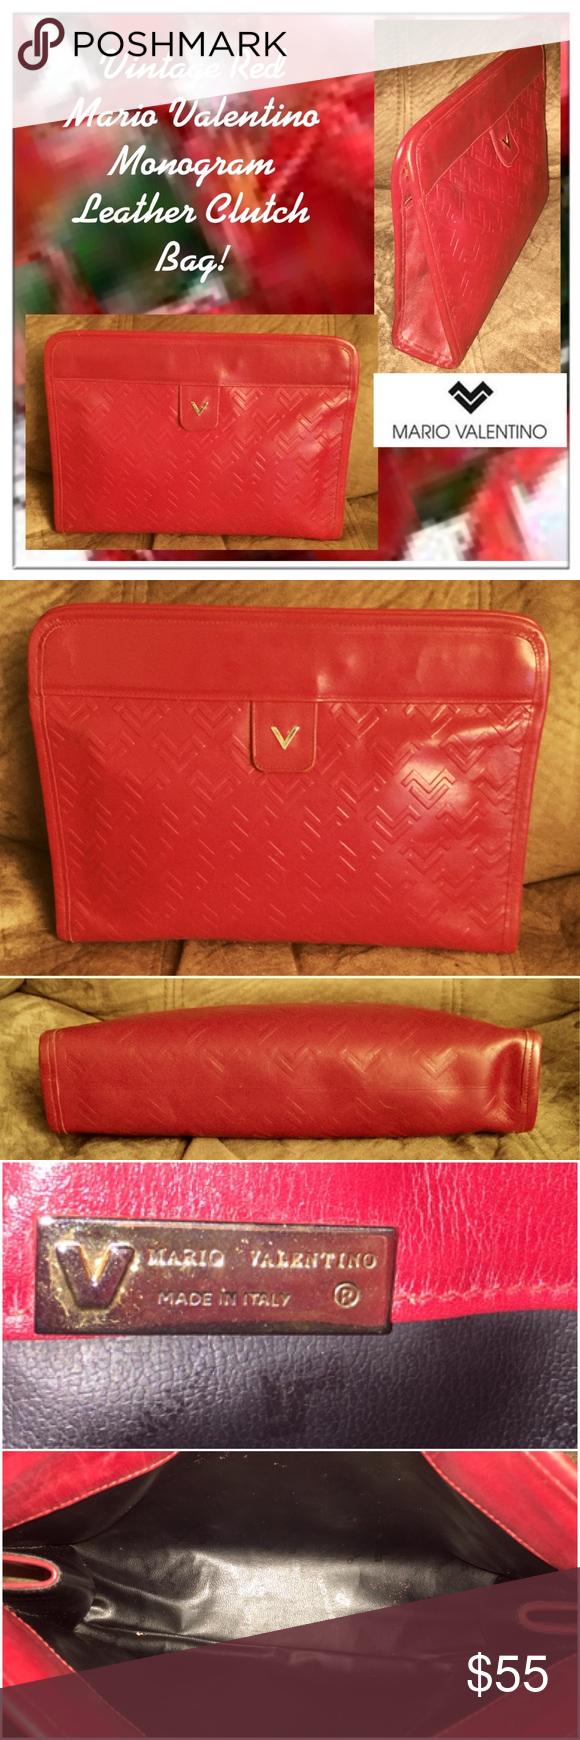 Vtg Red Valentino Monogram Leather Clutch Bag Leather Clutch Bags Monogrammed Leather Vintage Bags